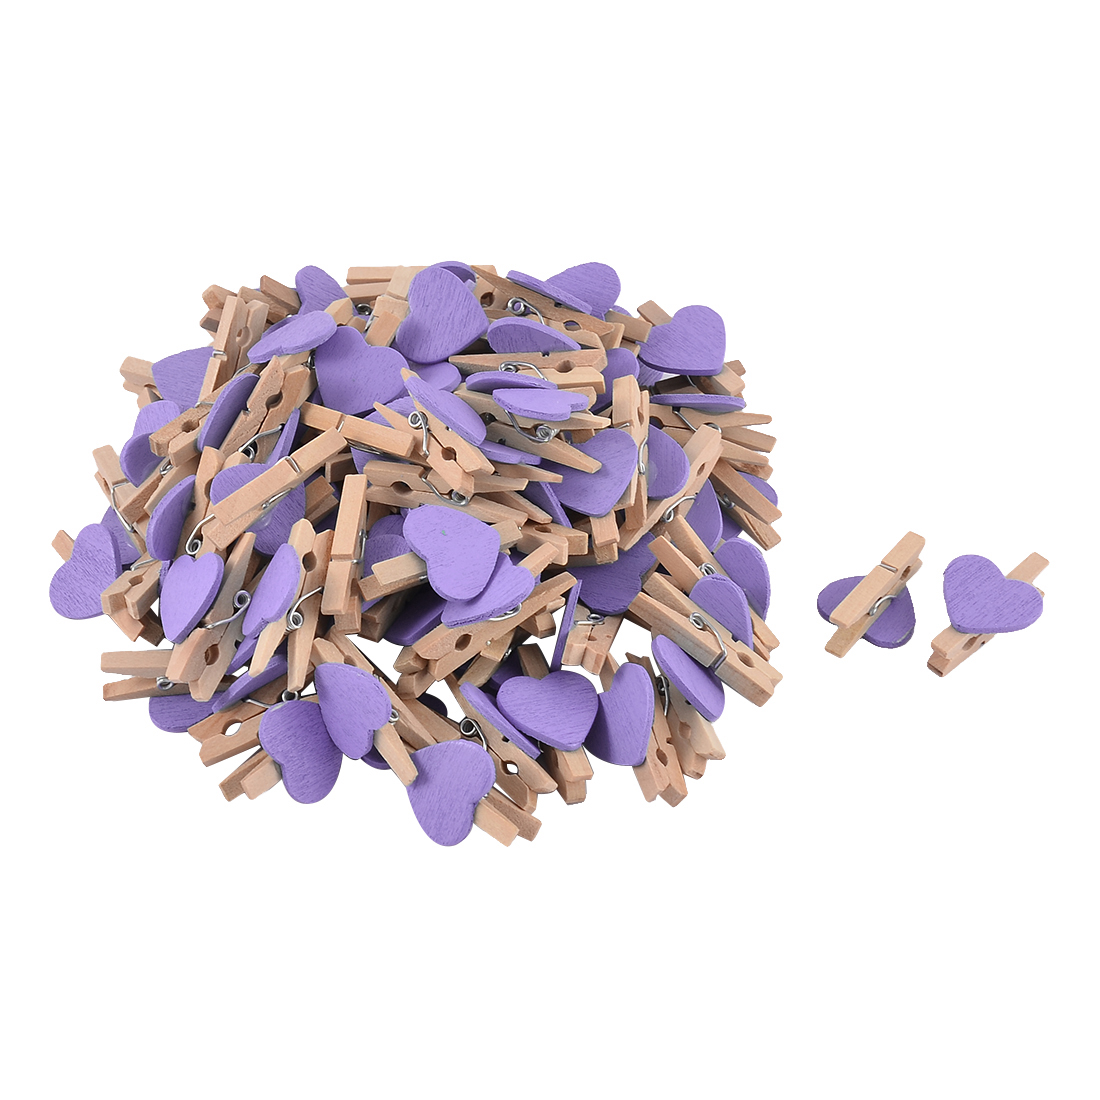 Card Photo Heart Shape DIY Crafts Spring Peg Mini Wooden Clip Purple 100pcs